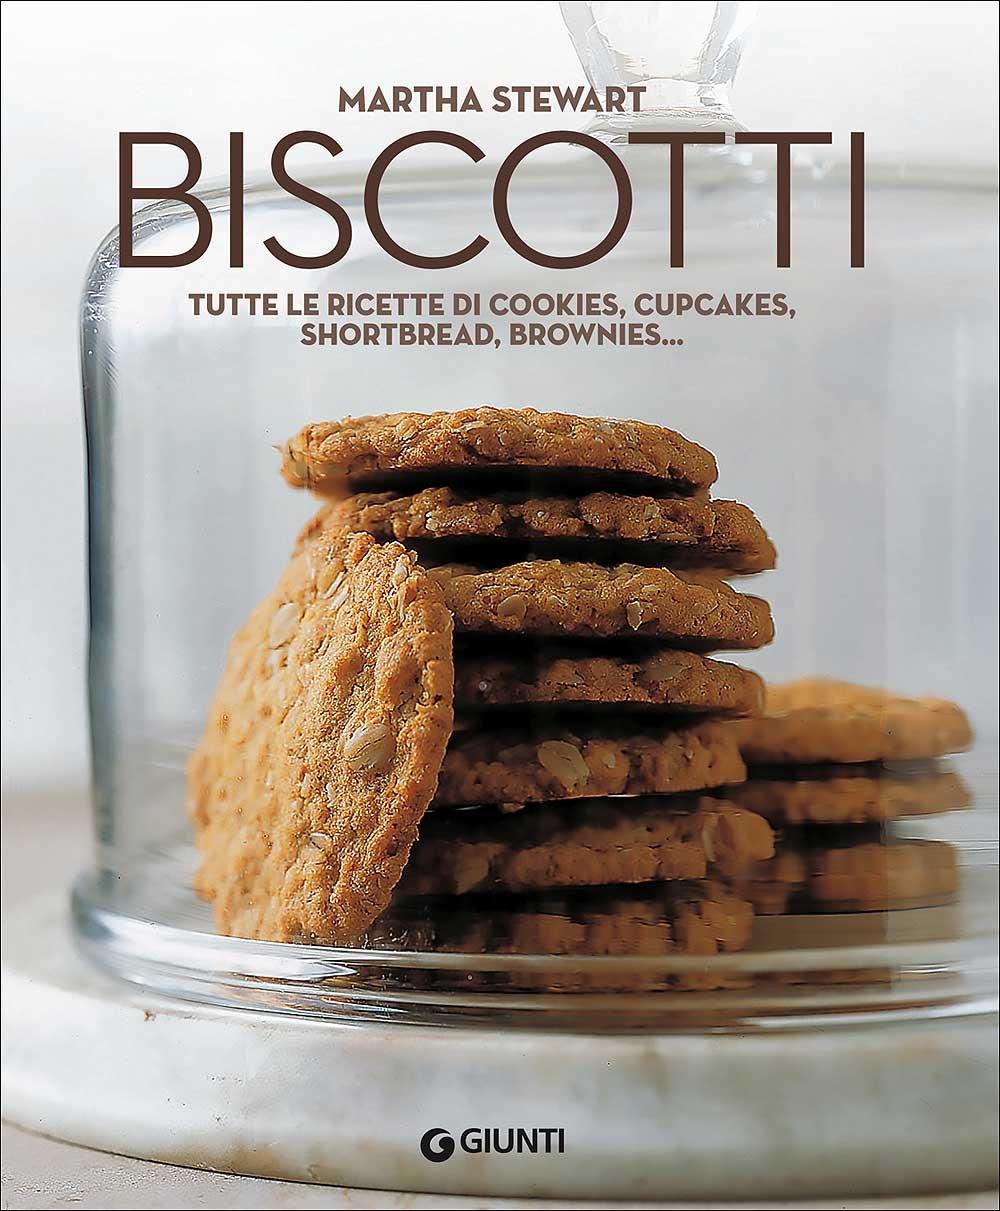 71Defd7HT%2BL - Biscotti. Tutte le ricette di cookies, cupcakes, shortbread, brownies...